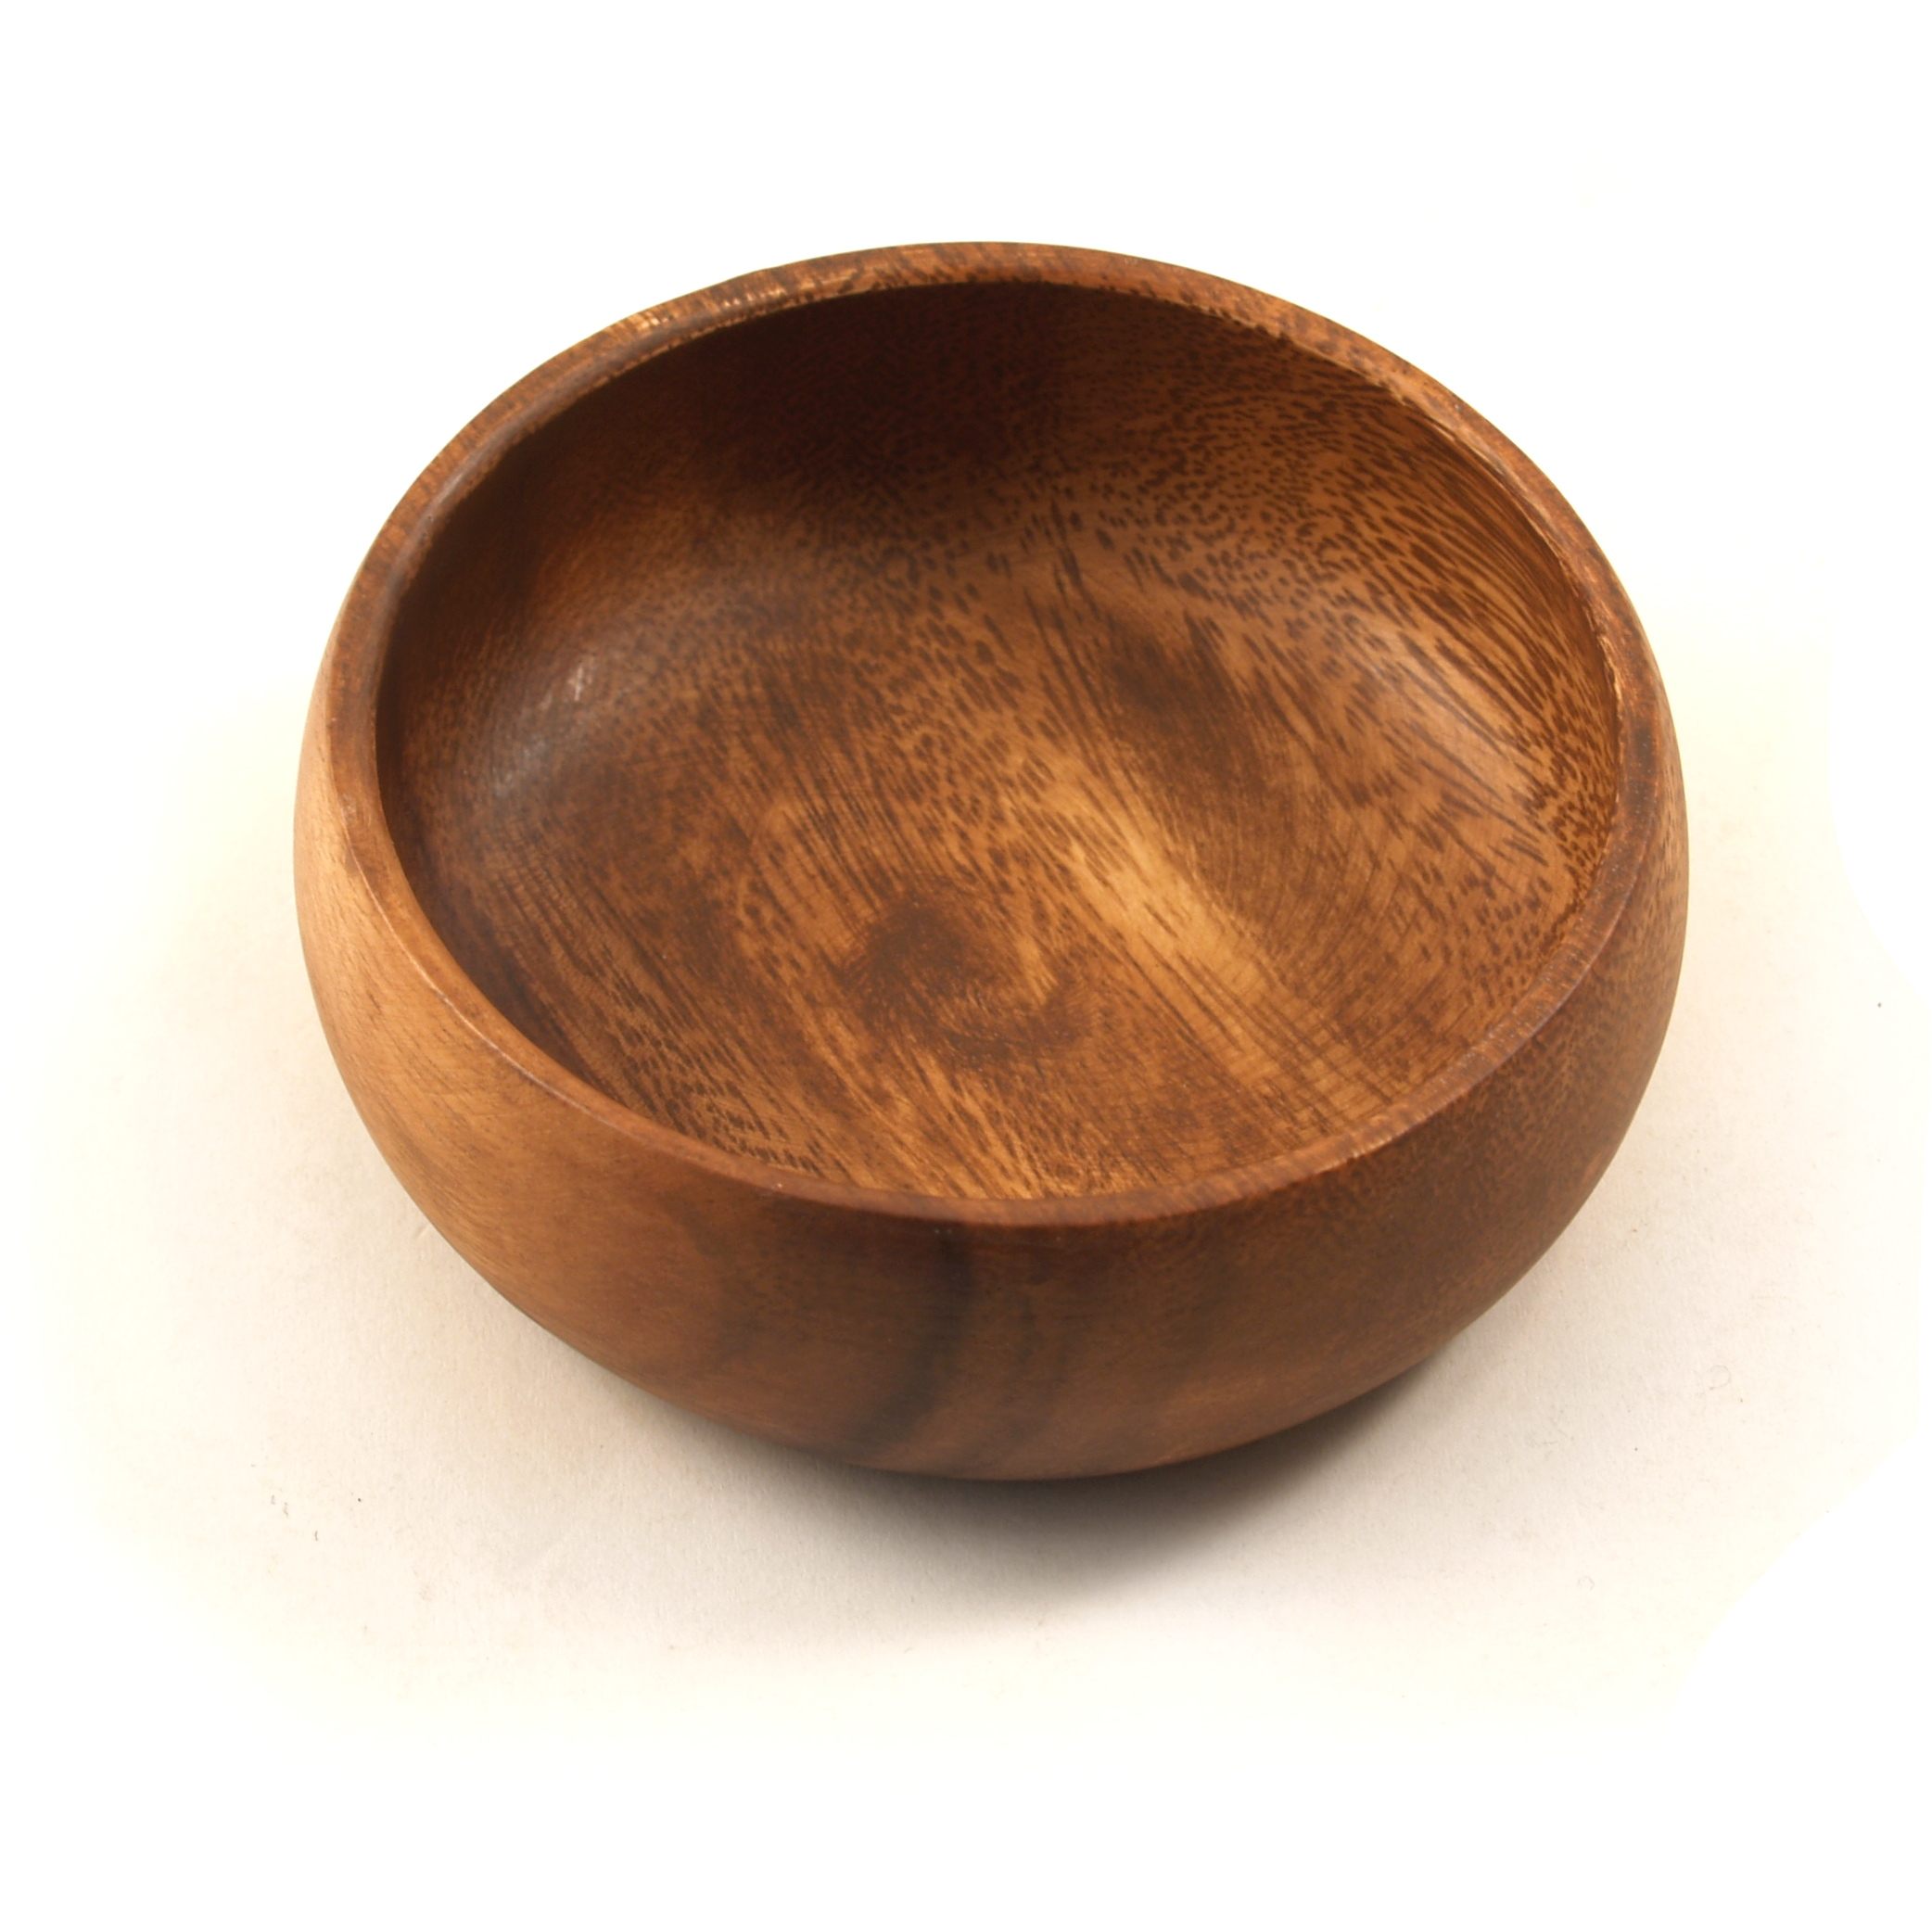 Pacific Merchants Acaciaware Round Calabash Dipping Bowl, 4 Inch